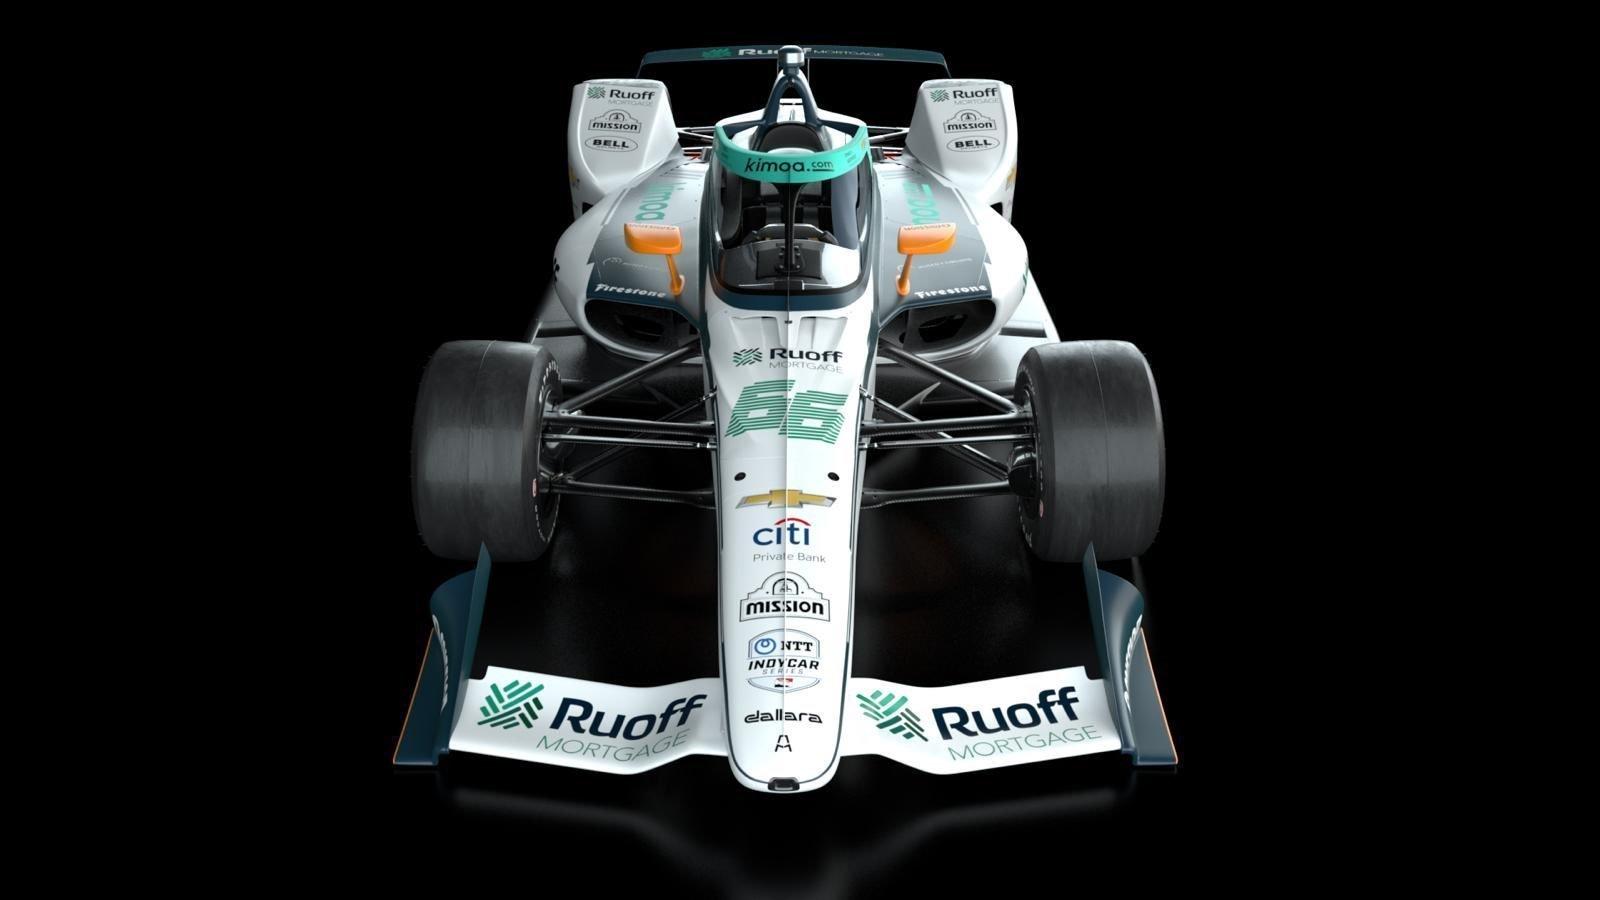 El coche de Fernando lt;HIT gt;Alonso lt;/HIT gt; para las lt;HIT gt;500 lt;/HIT gt; lt;HIT gt;Millas lt;/HIT gt; de Indianápolis 2020 Firma: Arrow McLaren SP